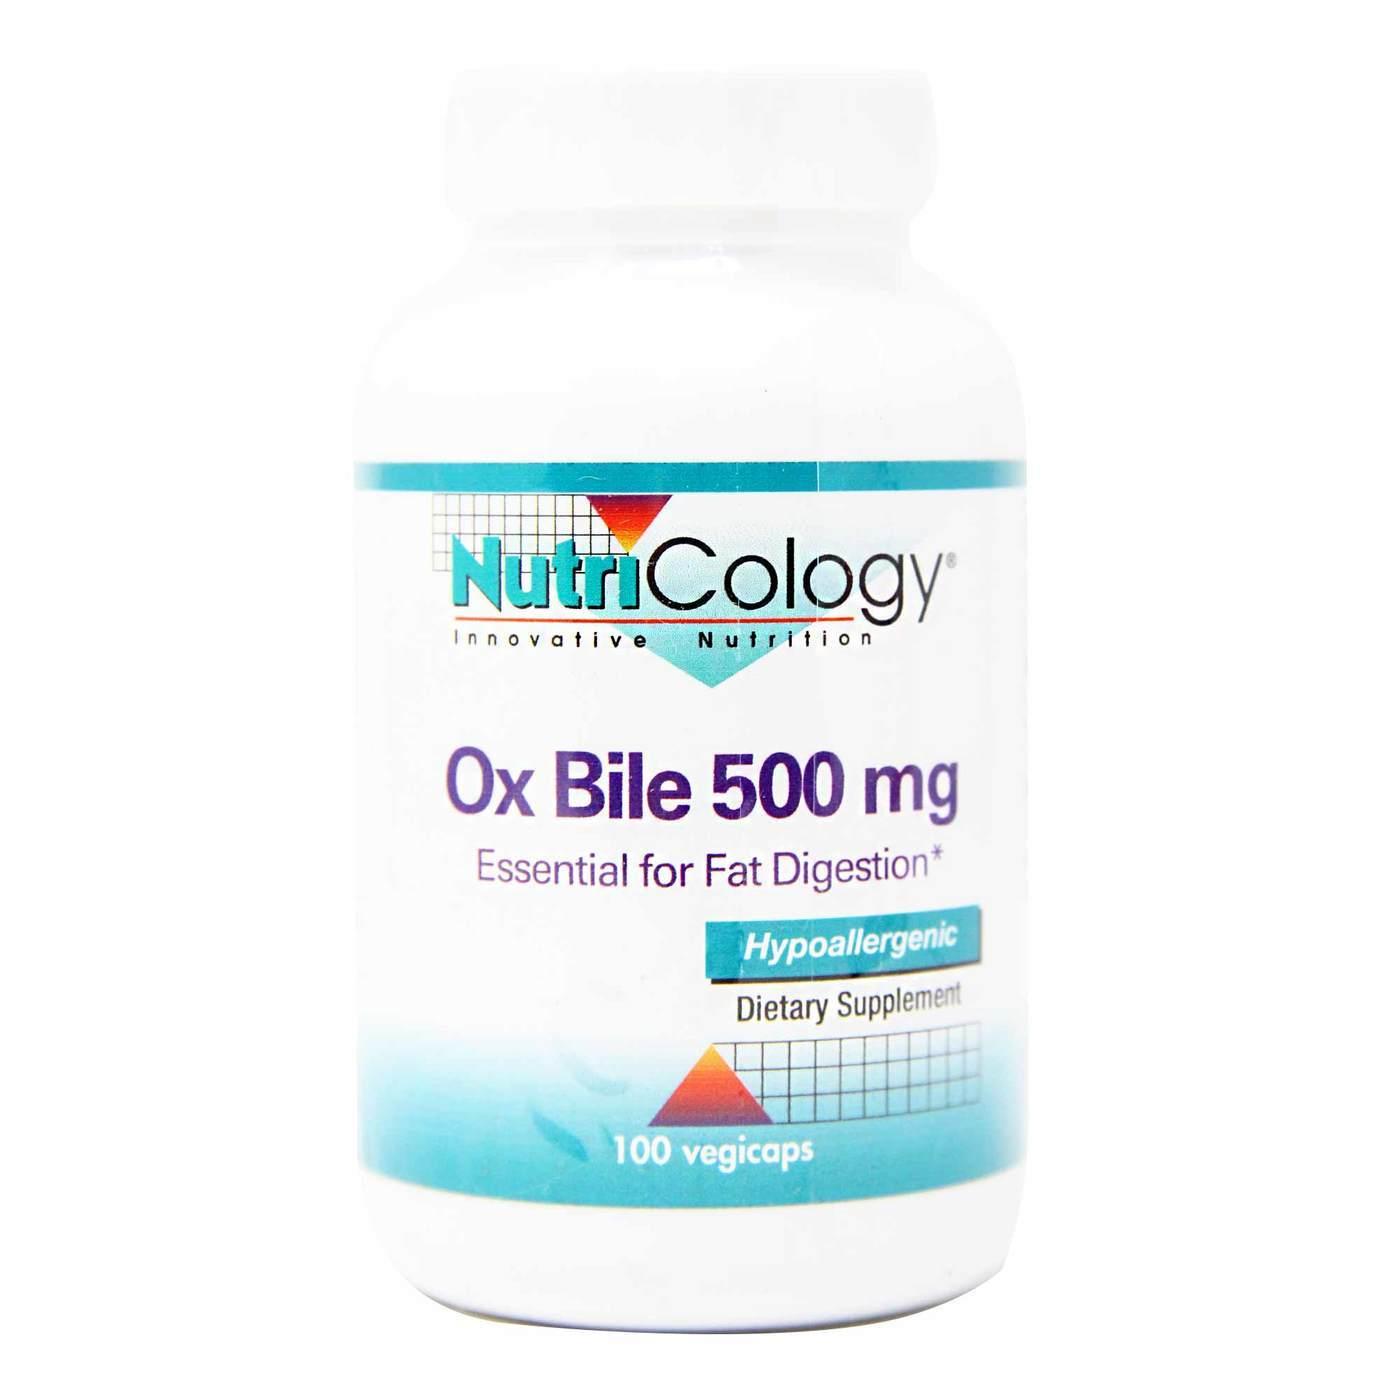 Generico Antabus 500 mg